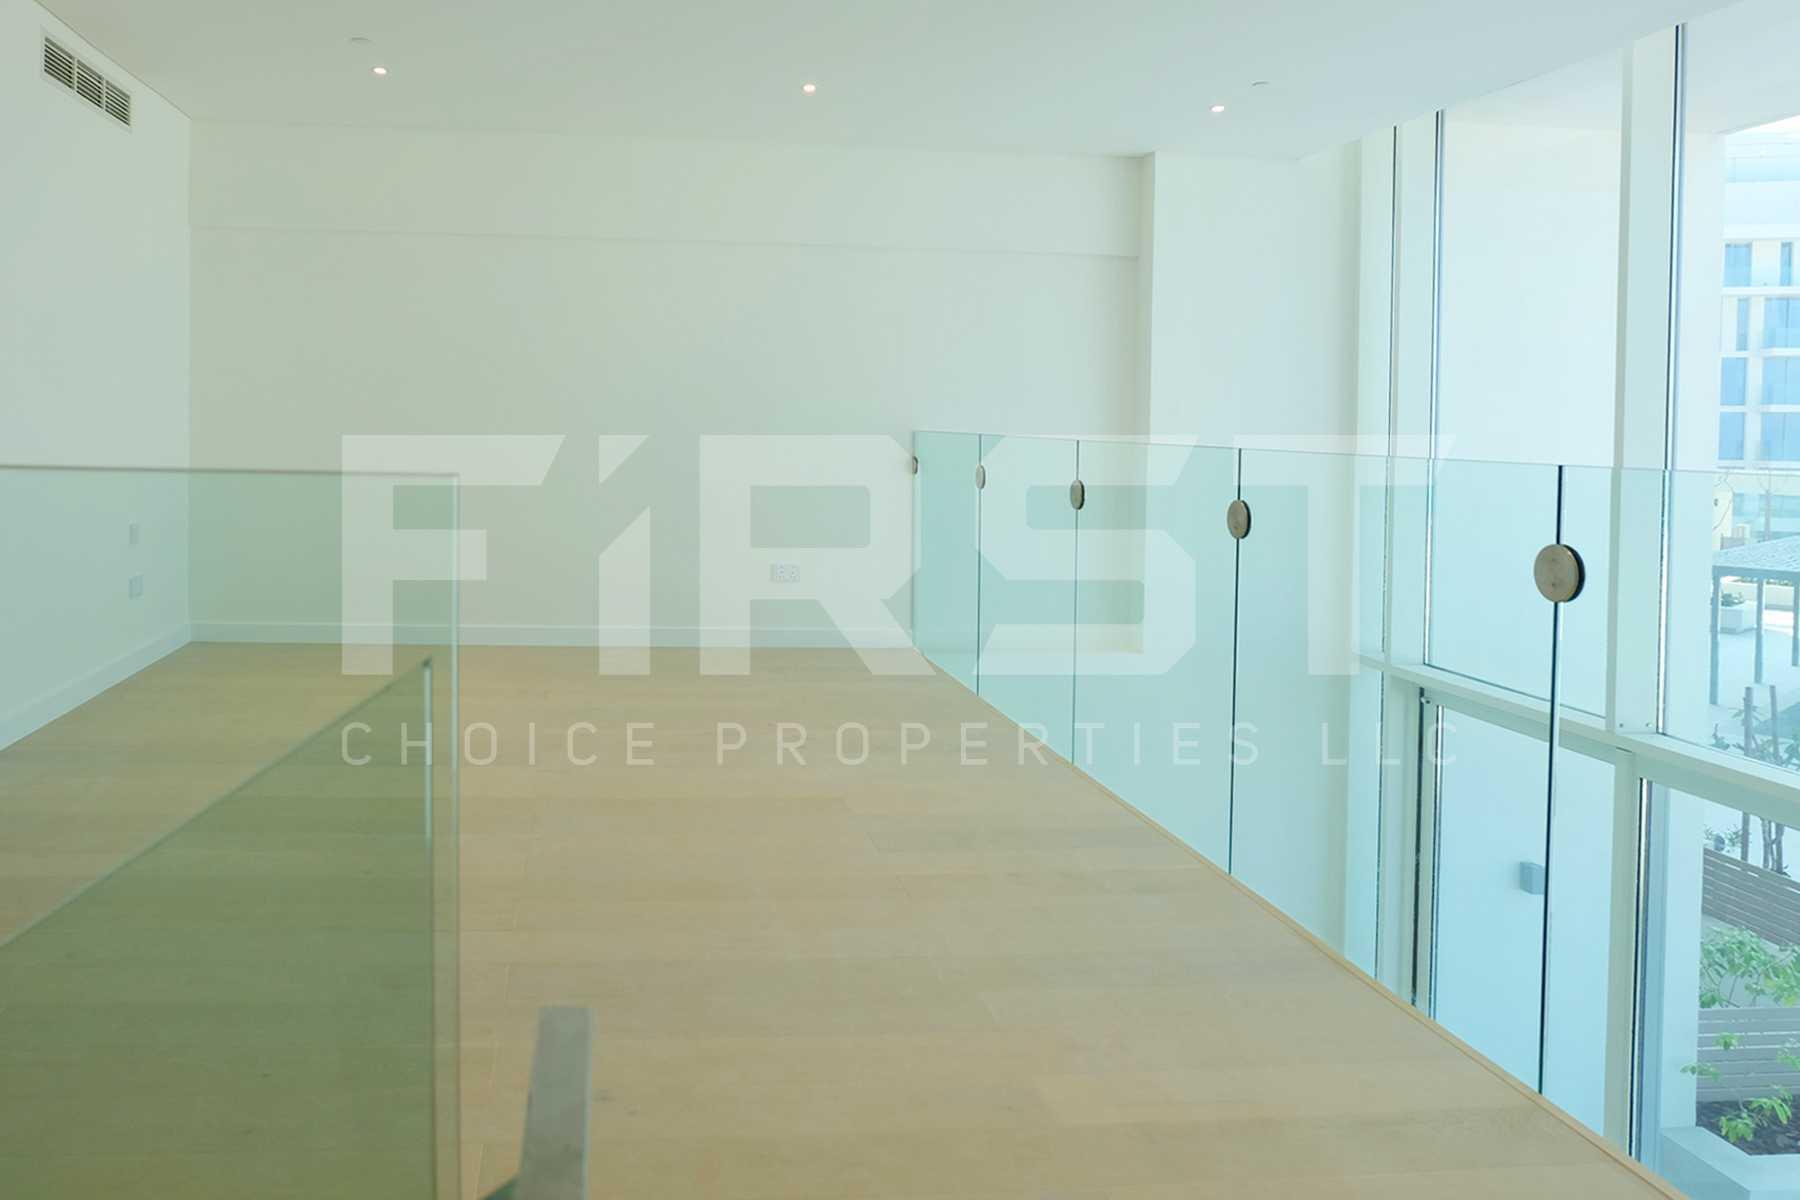 Internal Photo of 1 Bedroom Loft Apartment in Mamsha Al Saadiyat Island Abu Dhabi UAE (5).jpg